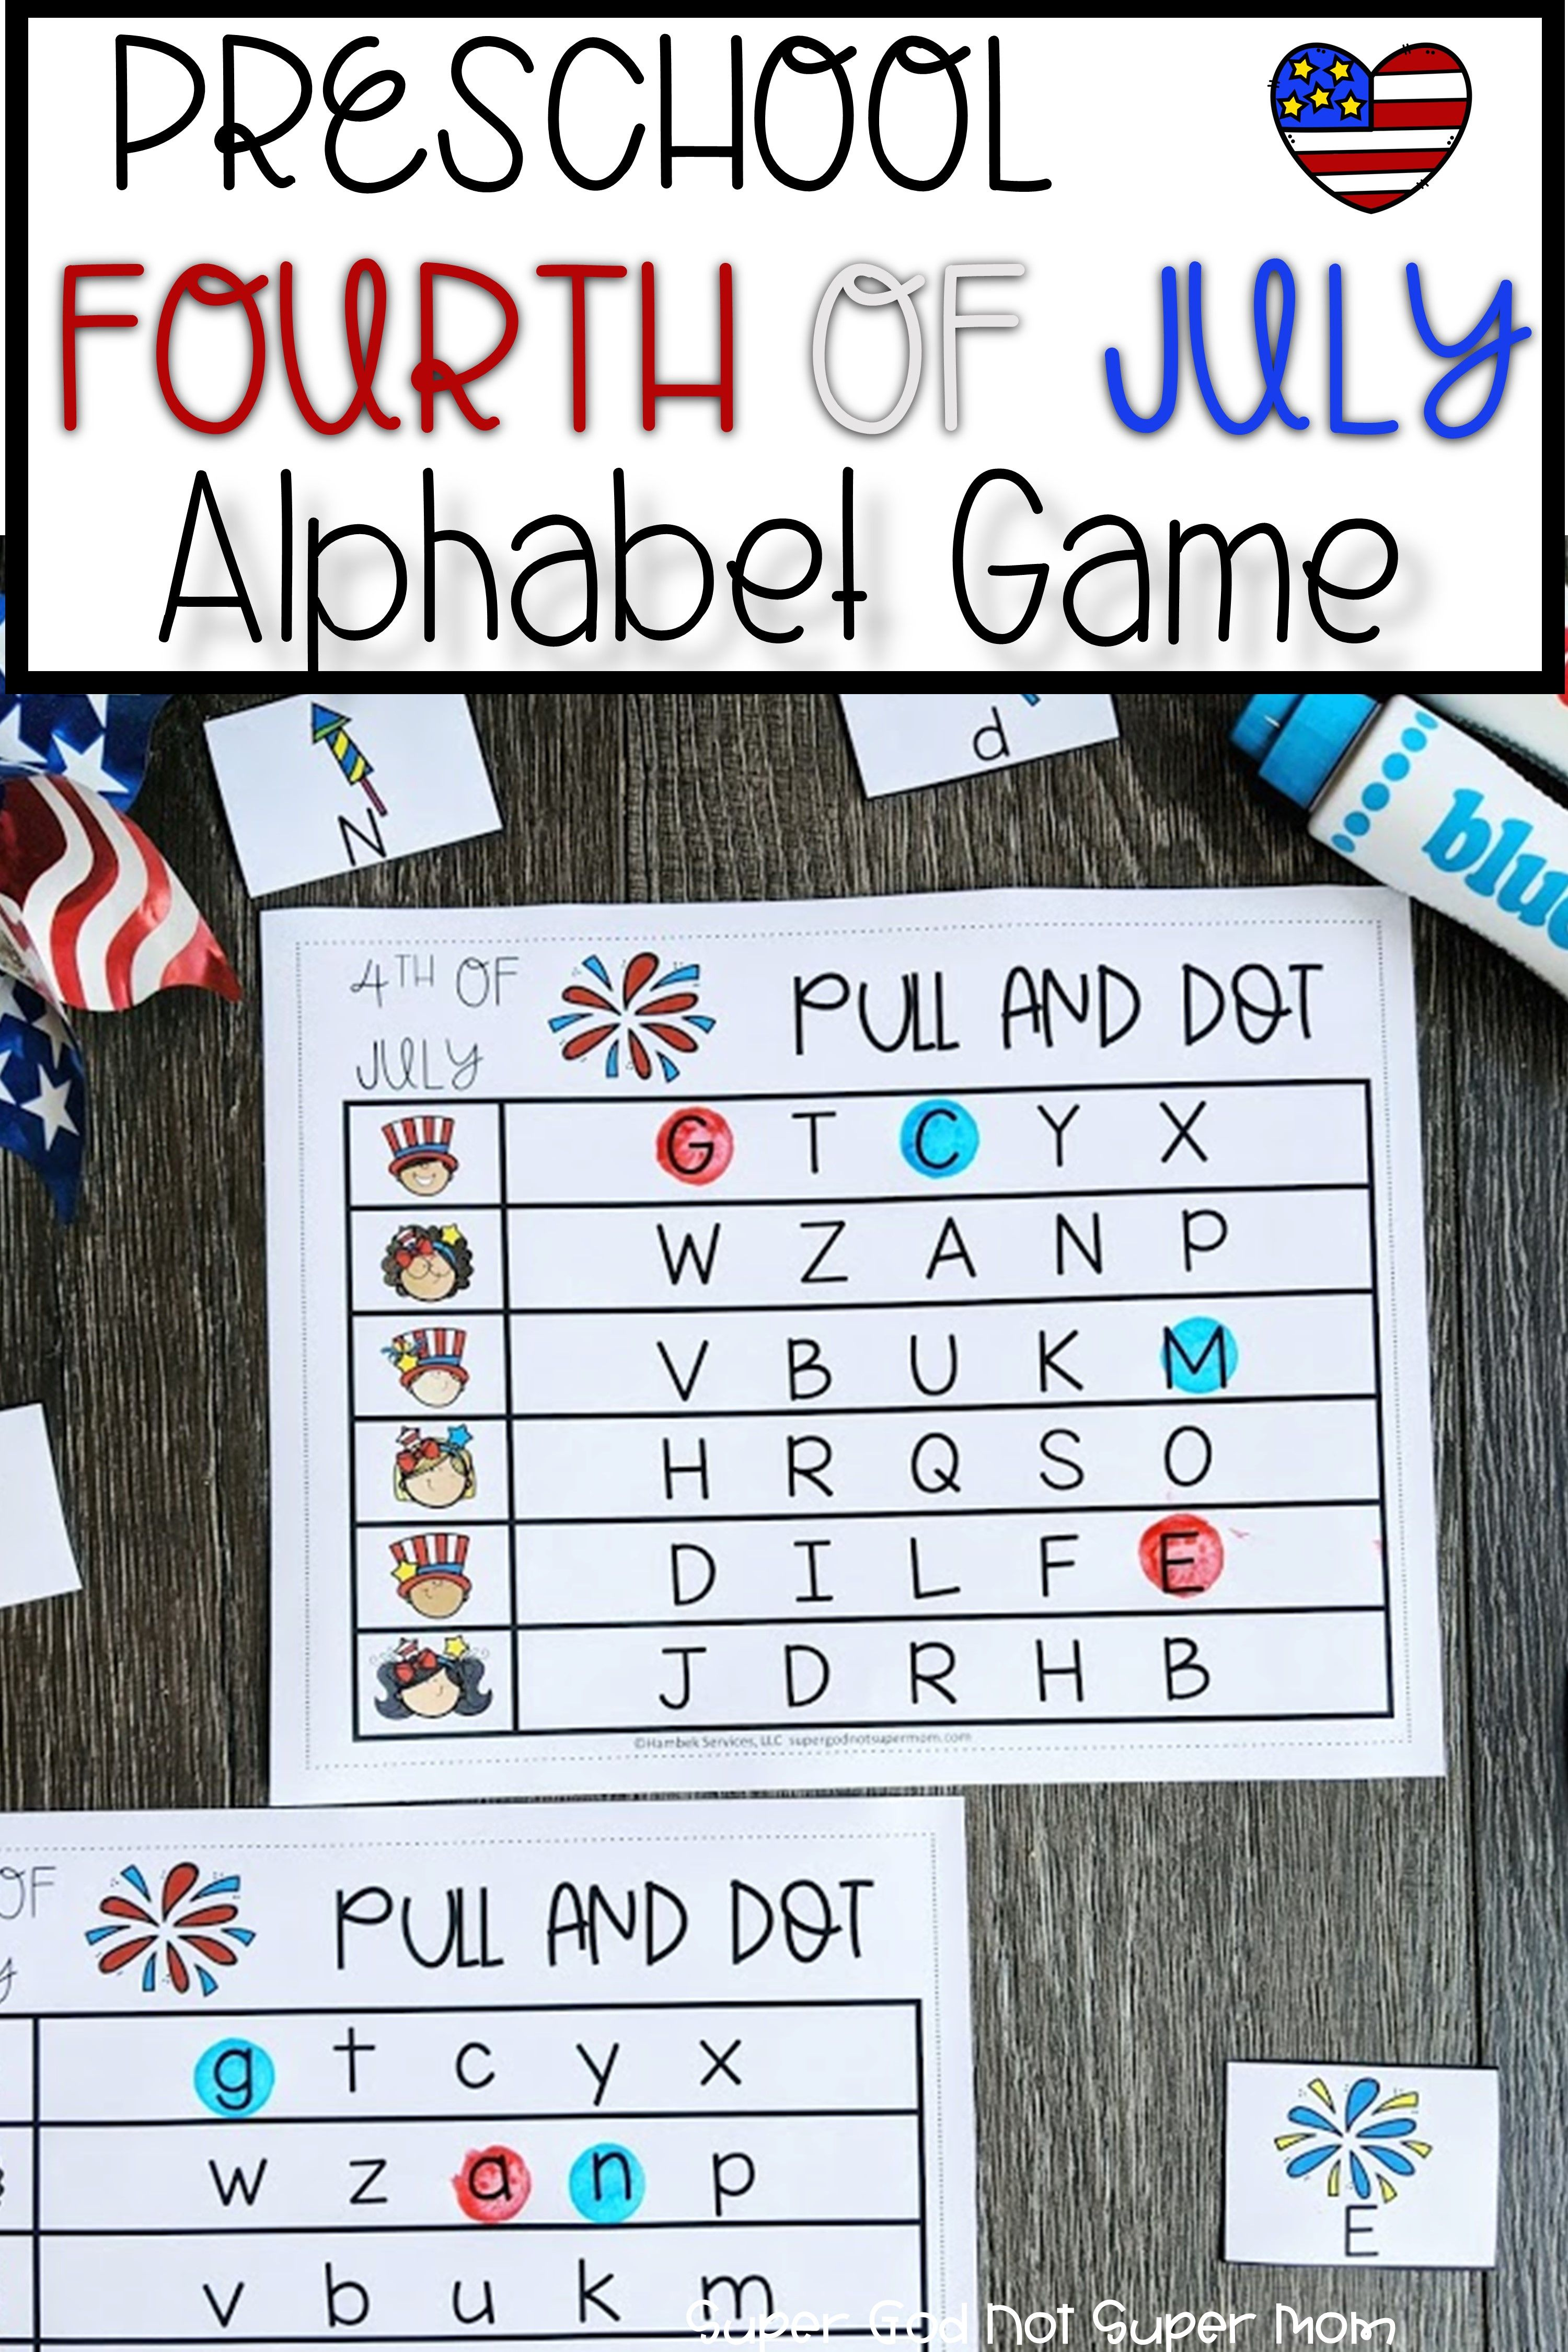 Fourth Of July Alphabet Activity Super God Not Super Mom Alphabet Activities Preschool Free Preschool Activities Alphabet Activities [ 4500 x 3000 Pixel ]